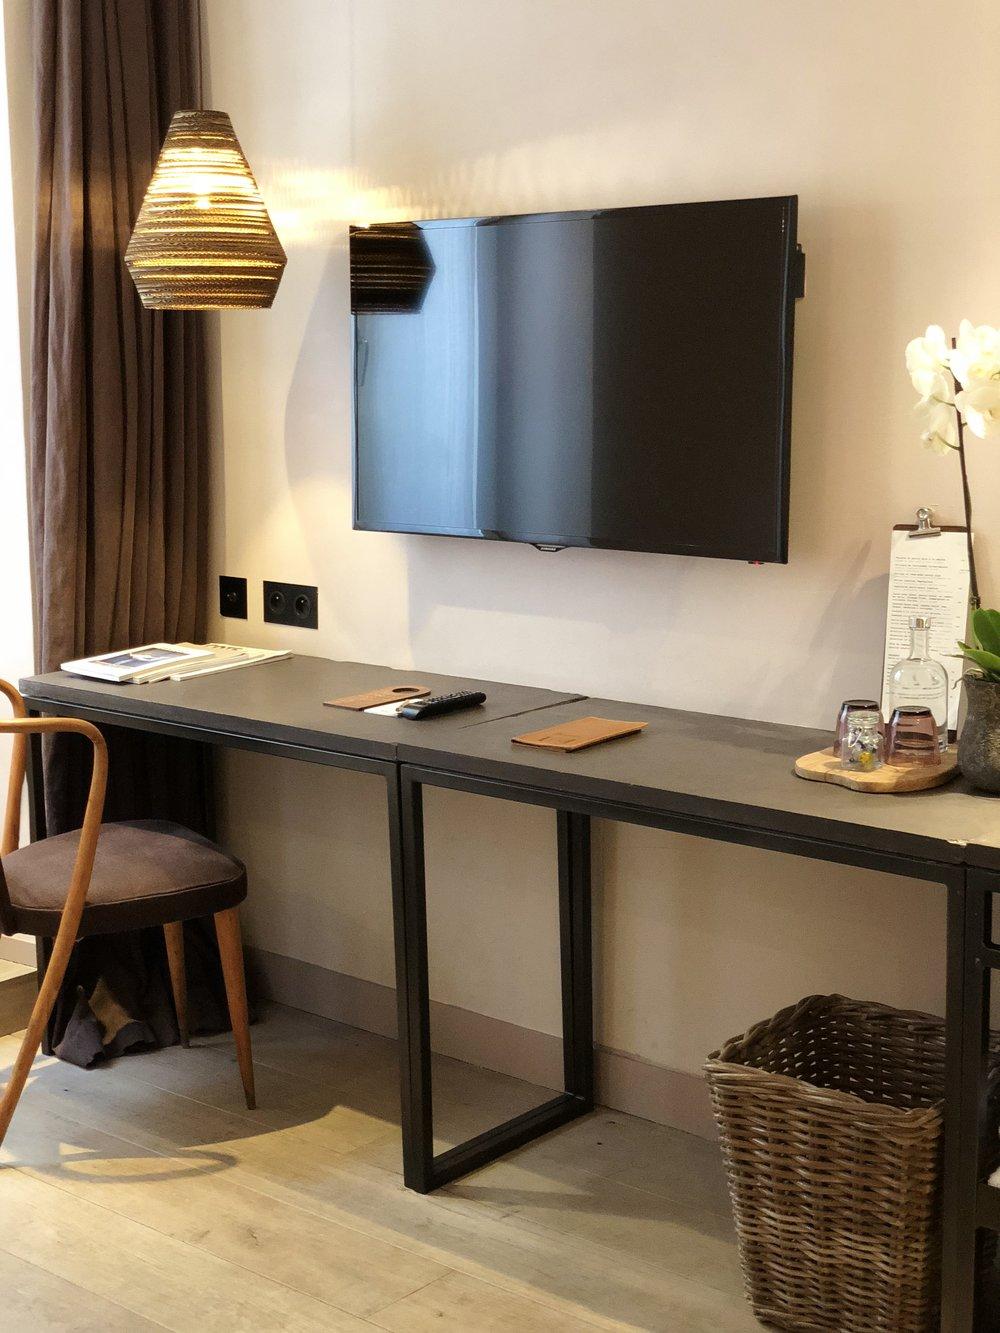 Bon-plan-Chambre-Hotel-Hidden-Day-use-elisa-les-bons-tuyaux.JPG